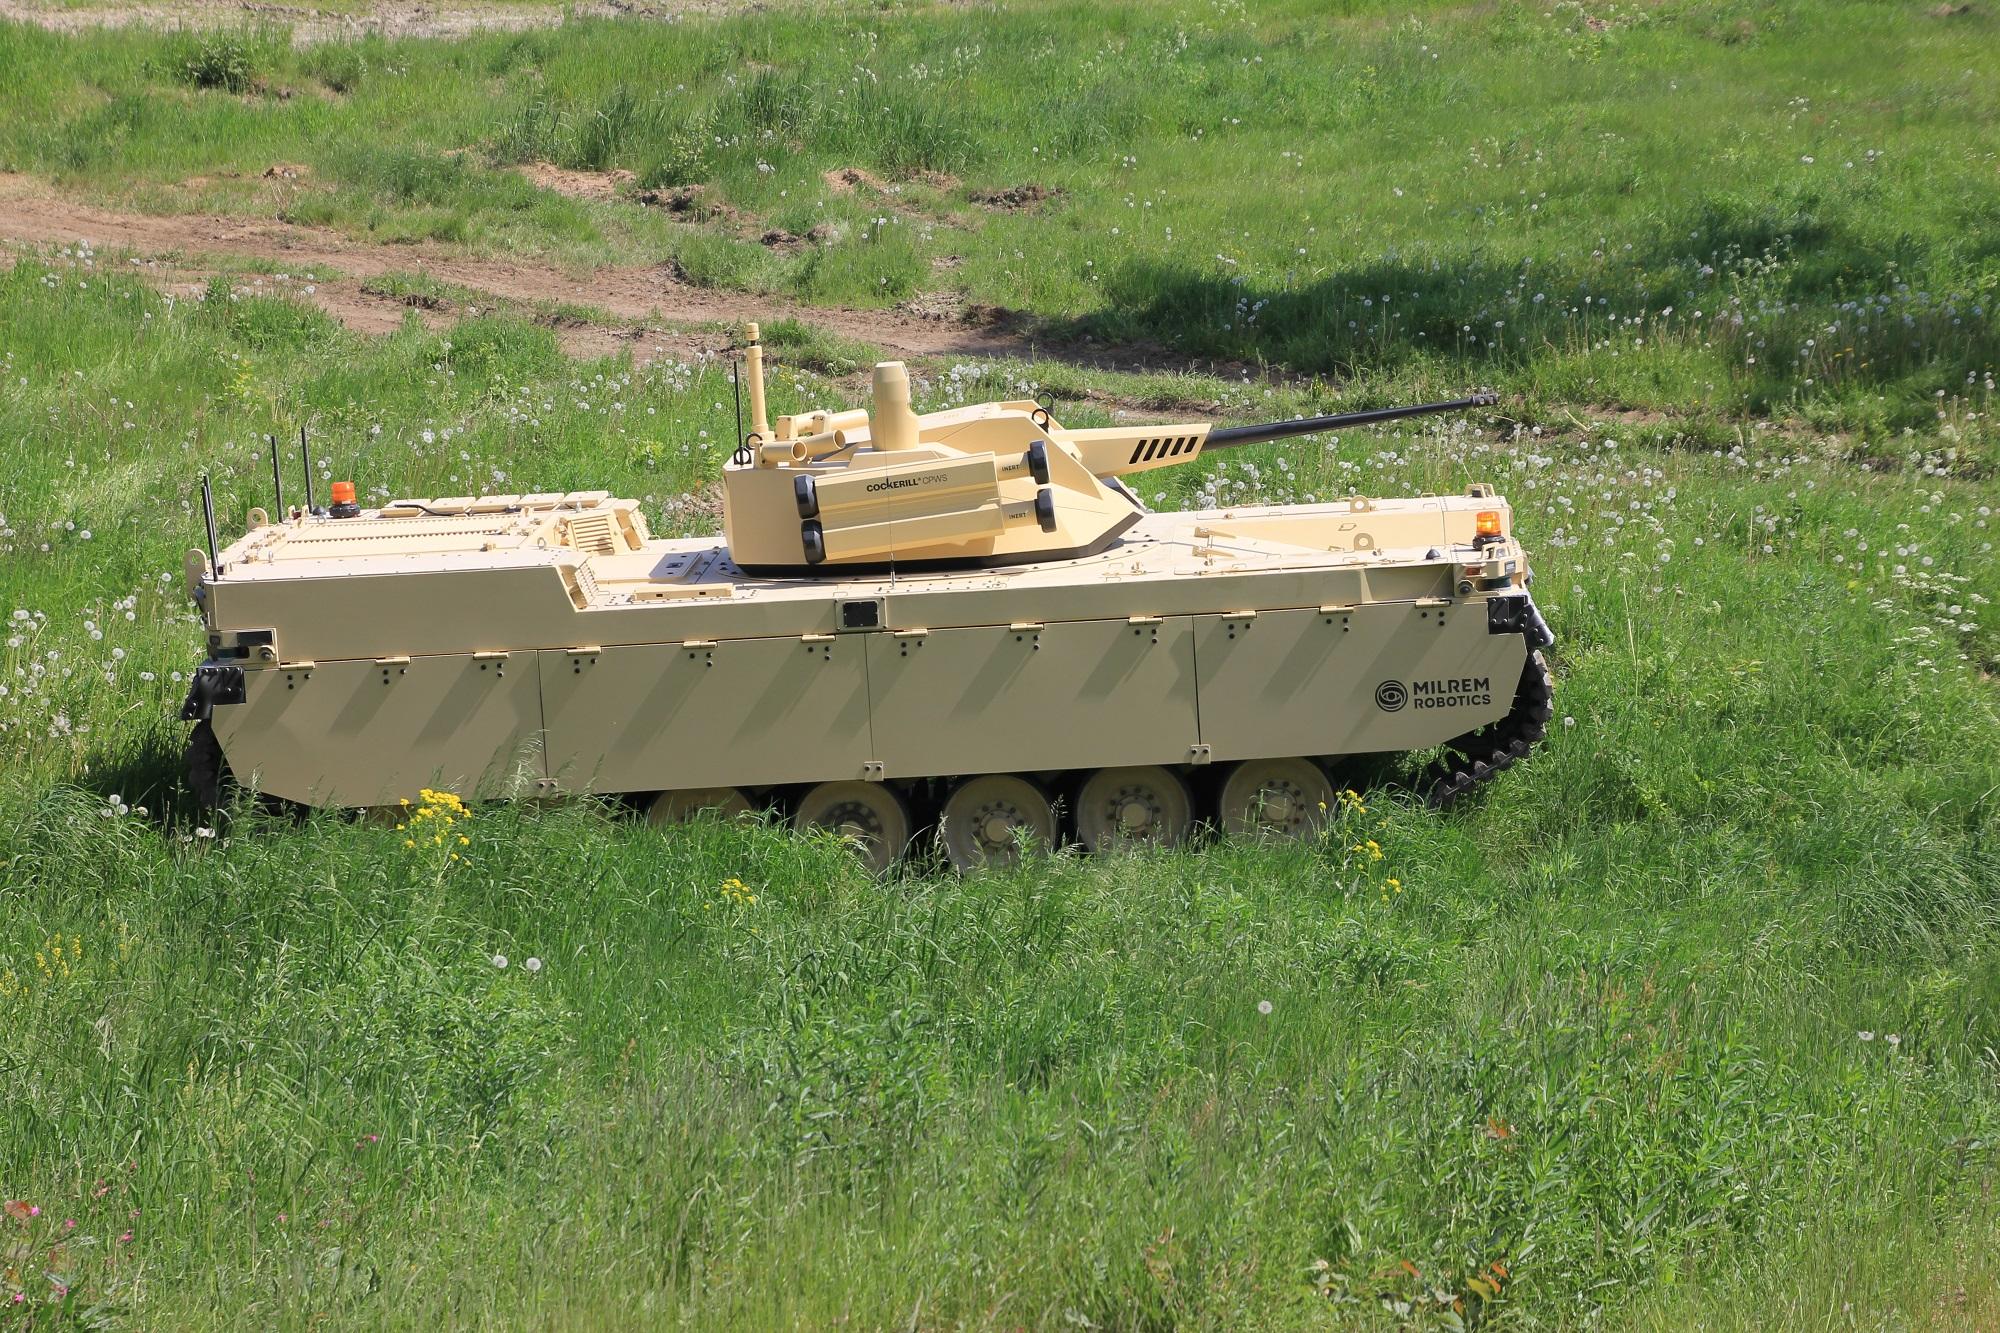 Milrem Robotics Type-X Robotic Combat Vehicle with the CPWS II turret by John Cockerill